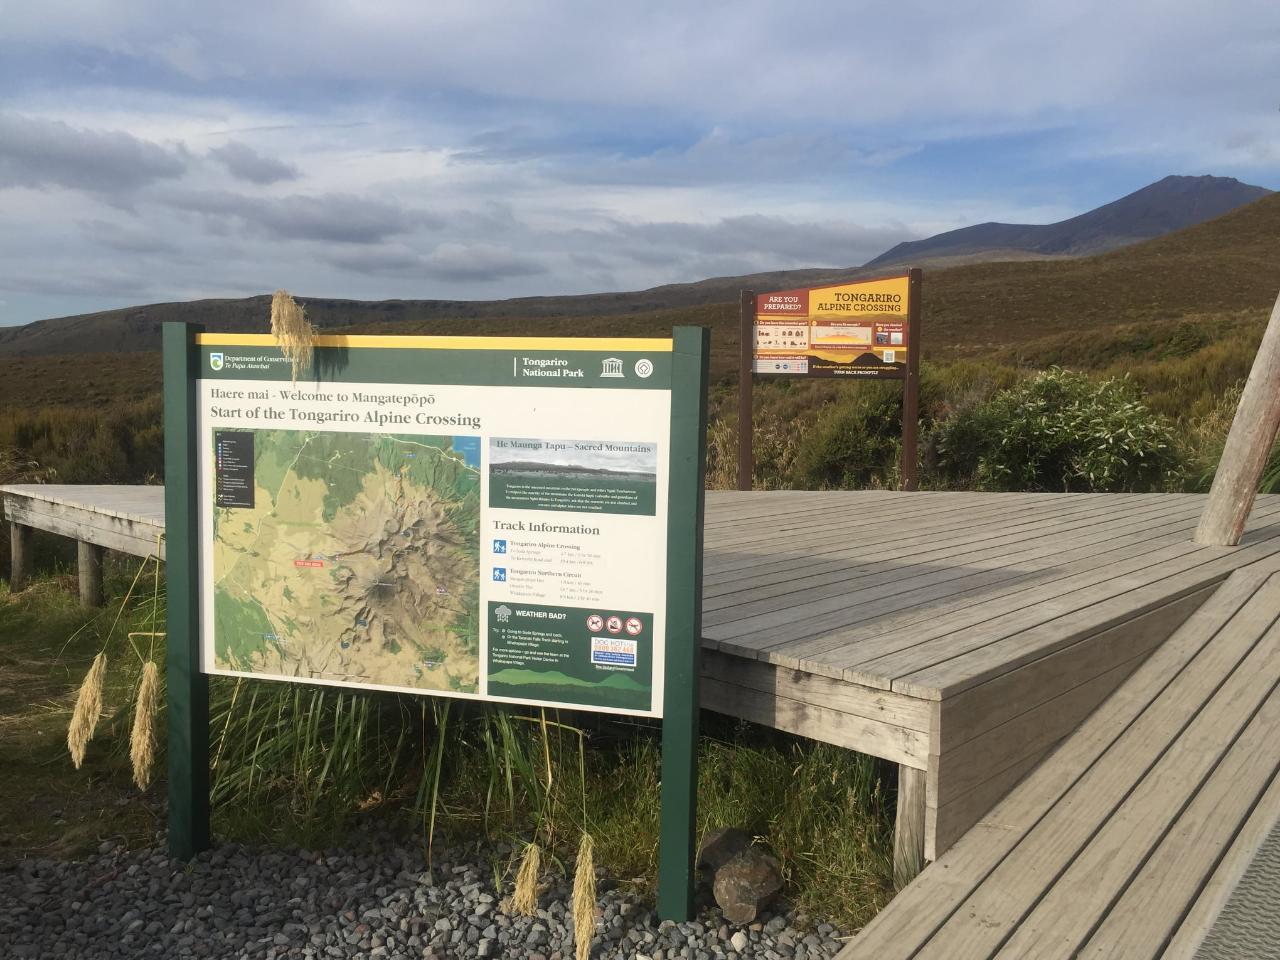 Mangatepopo - To/From Whakapapa Village